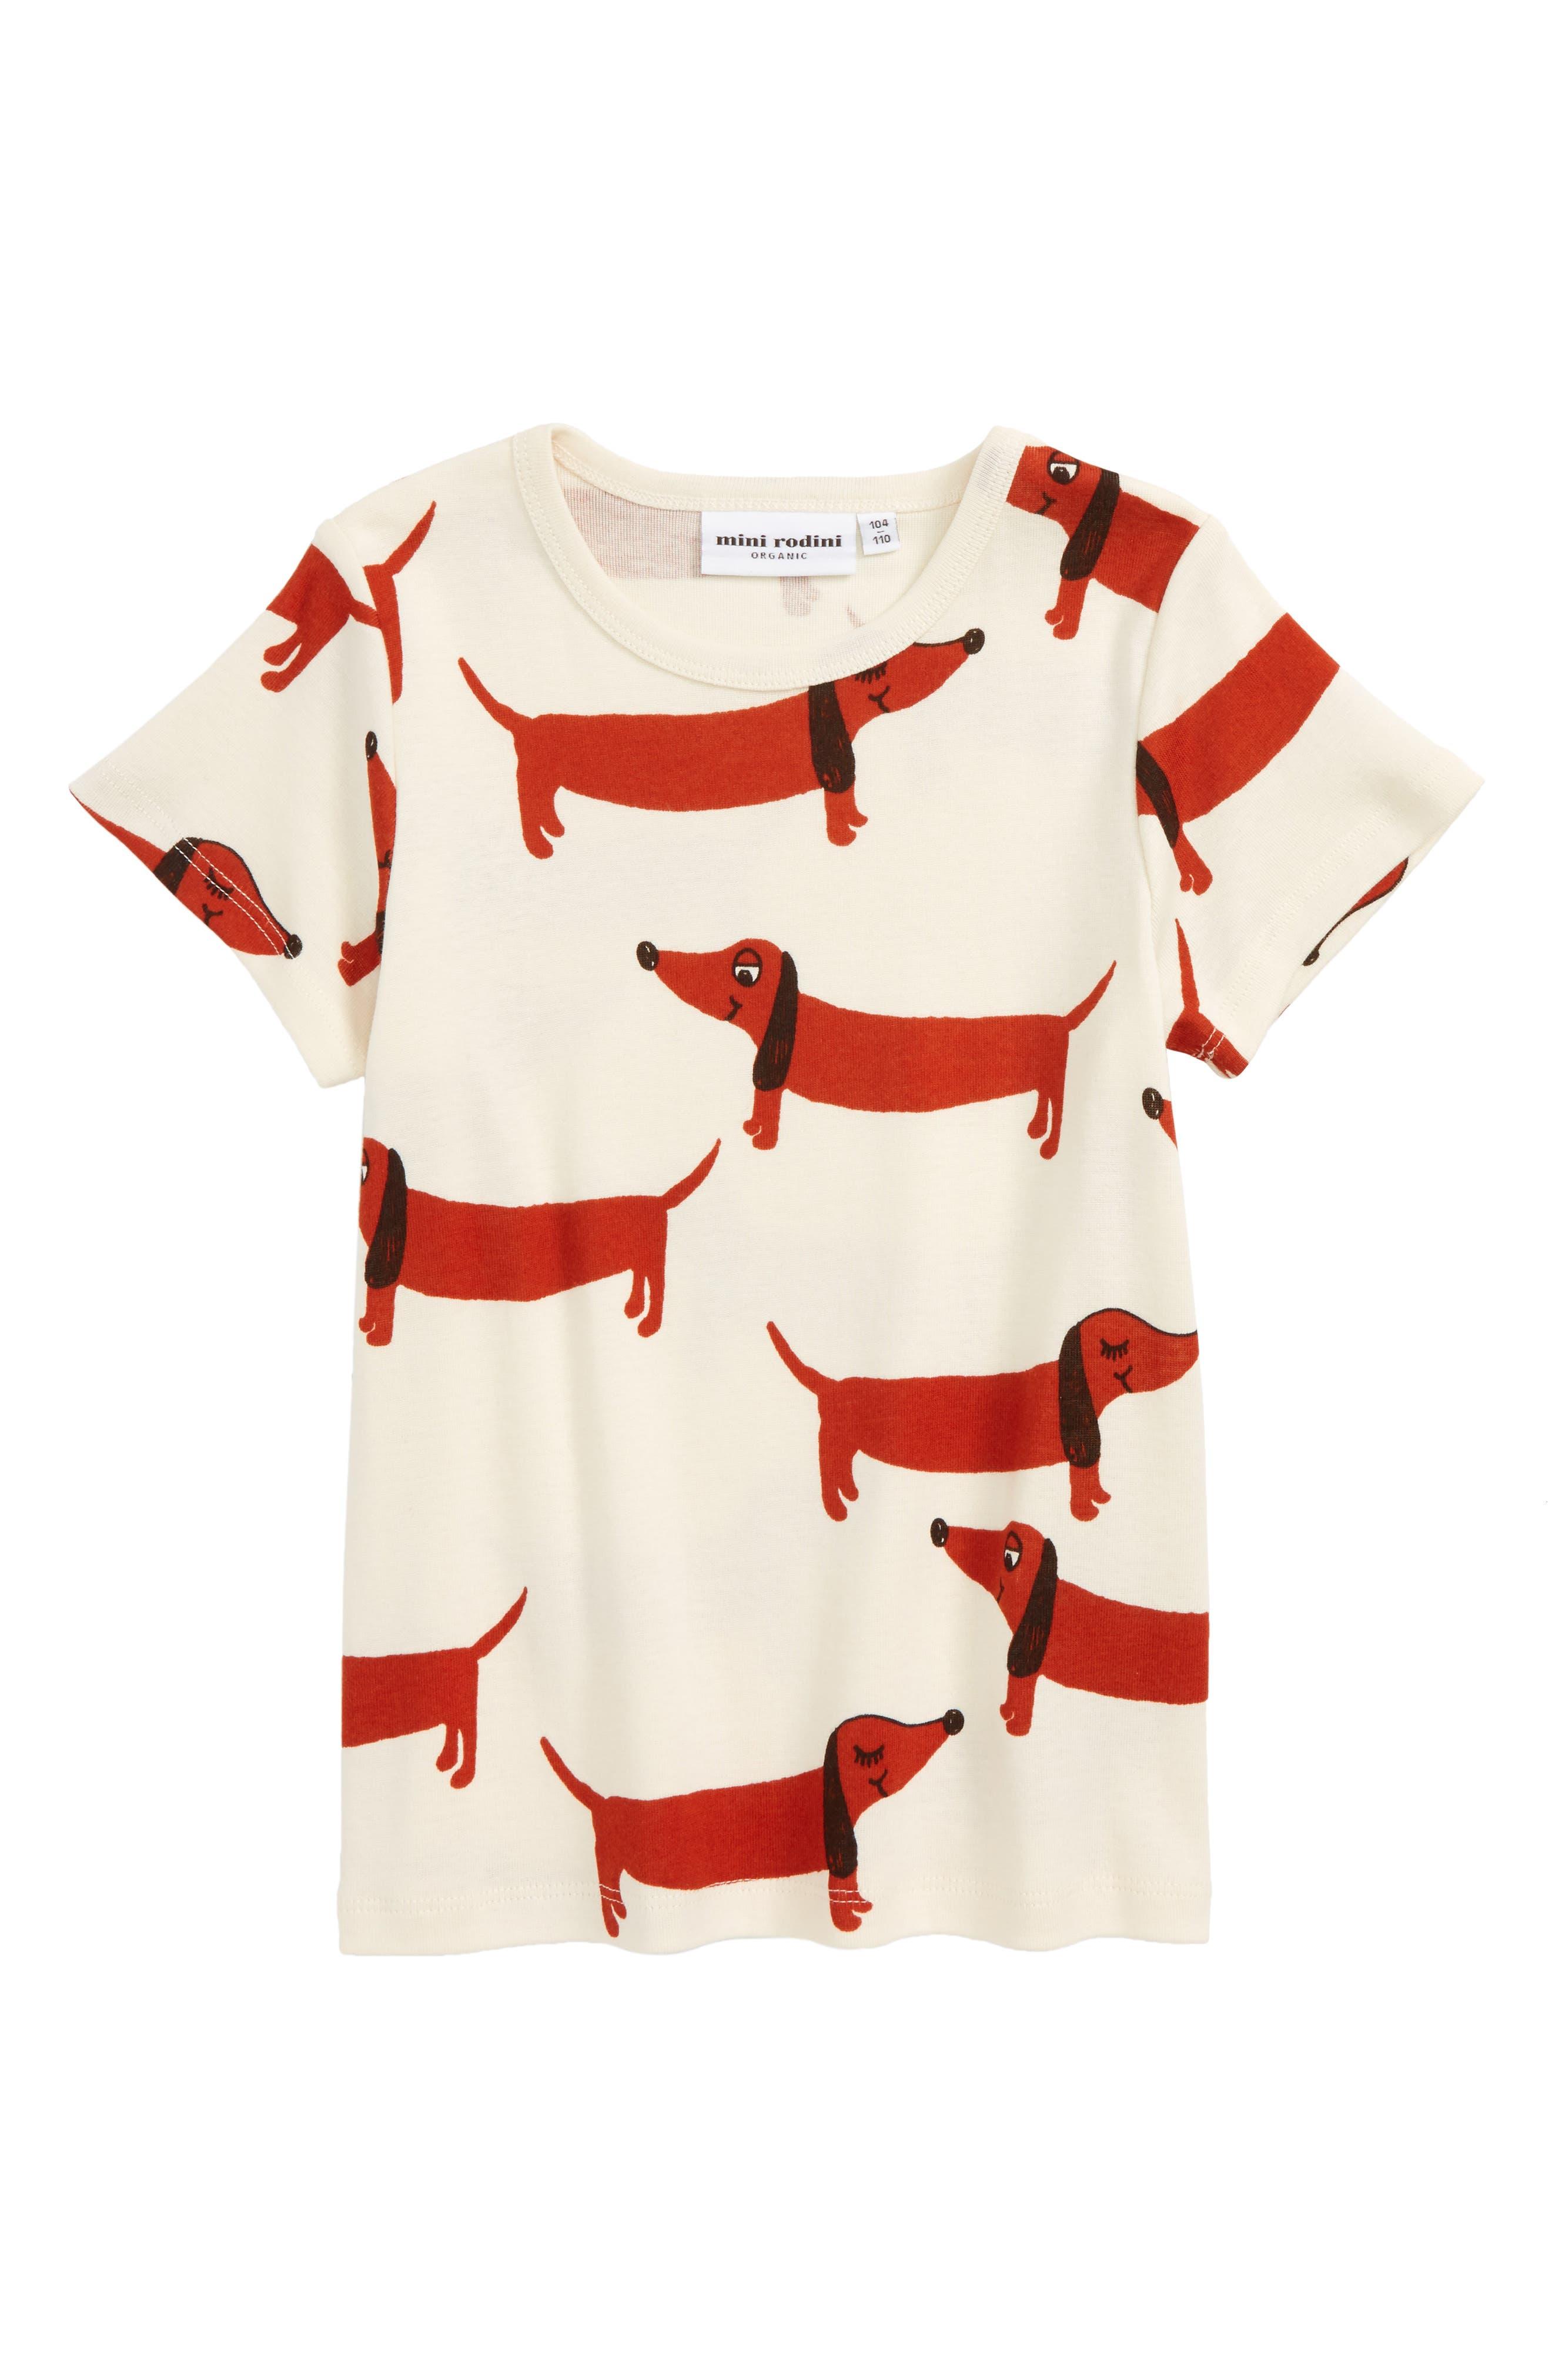 Alternate Image 1 Selected - Mini Rodini Dog Graphic T-Shirt (Toddler Boys & Little Boys)